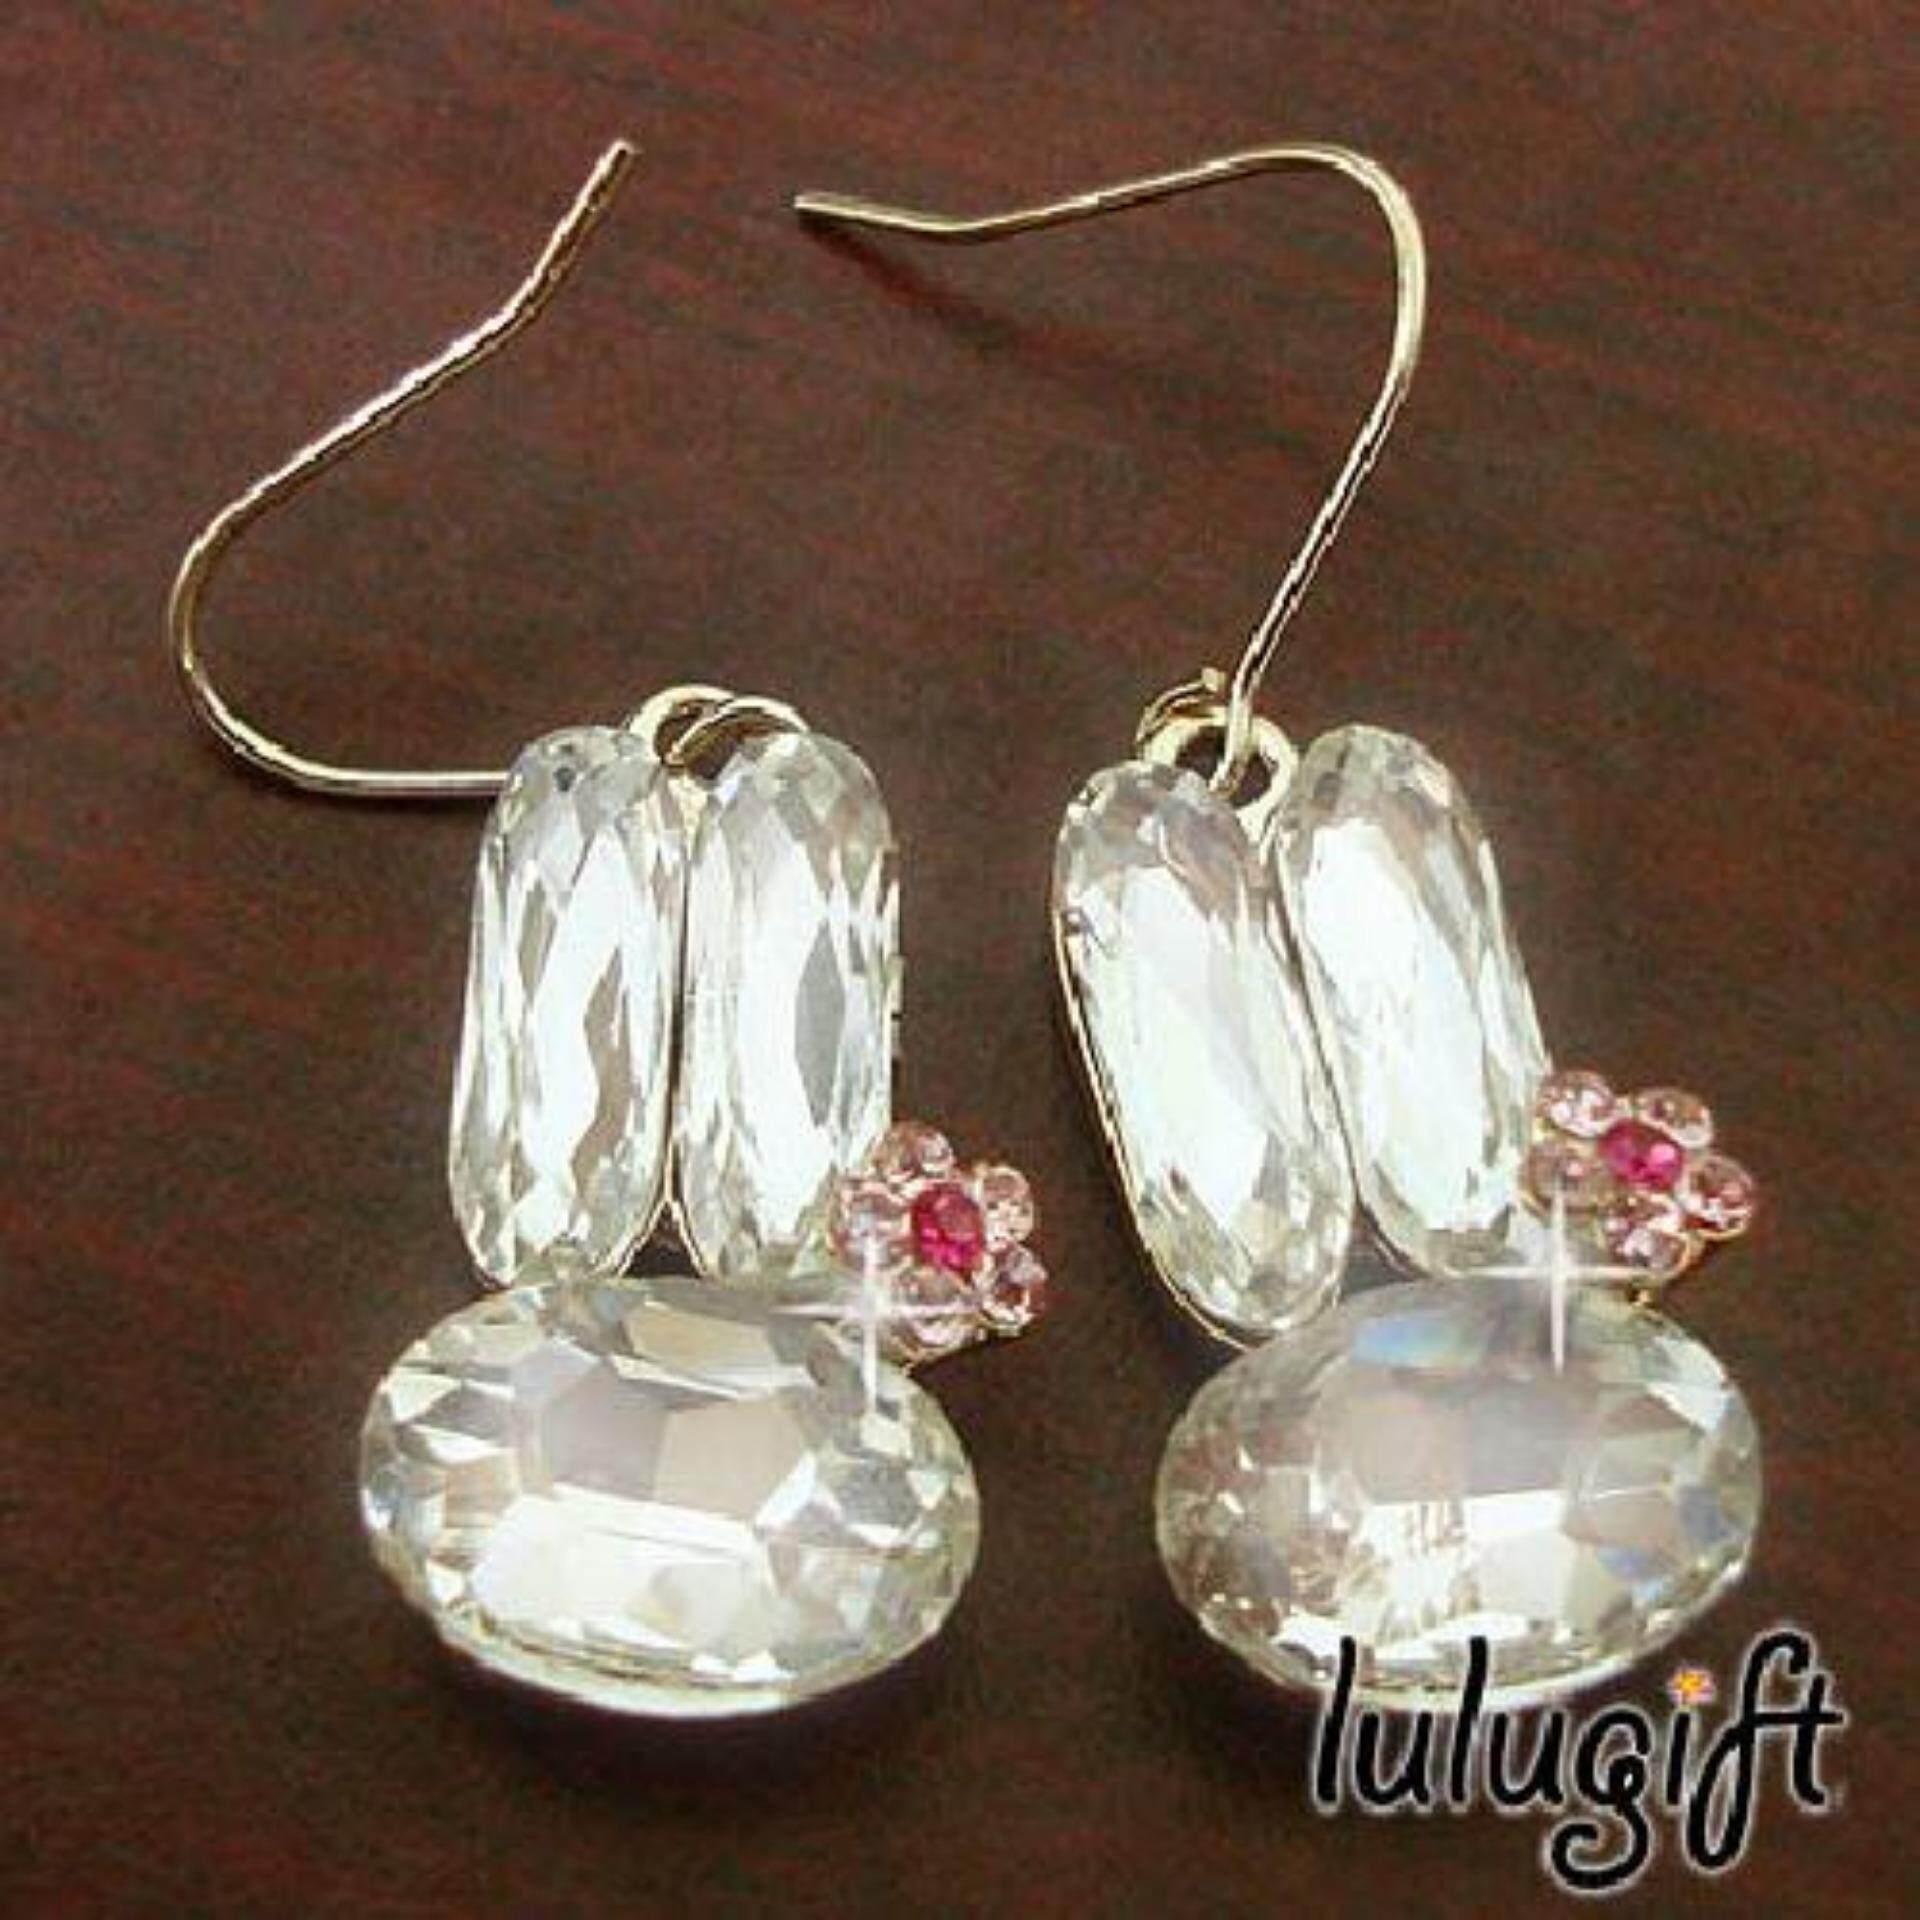 86ee2d20d Lulugift Korean Design Beautiful Bunny Gems Swarovski Earring e2268